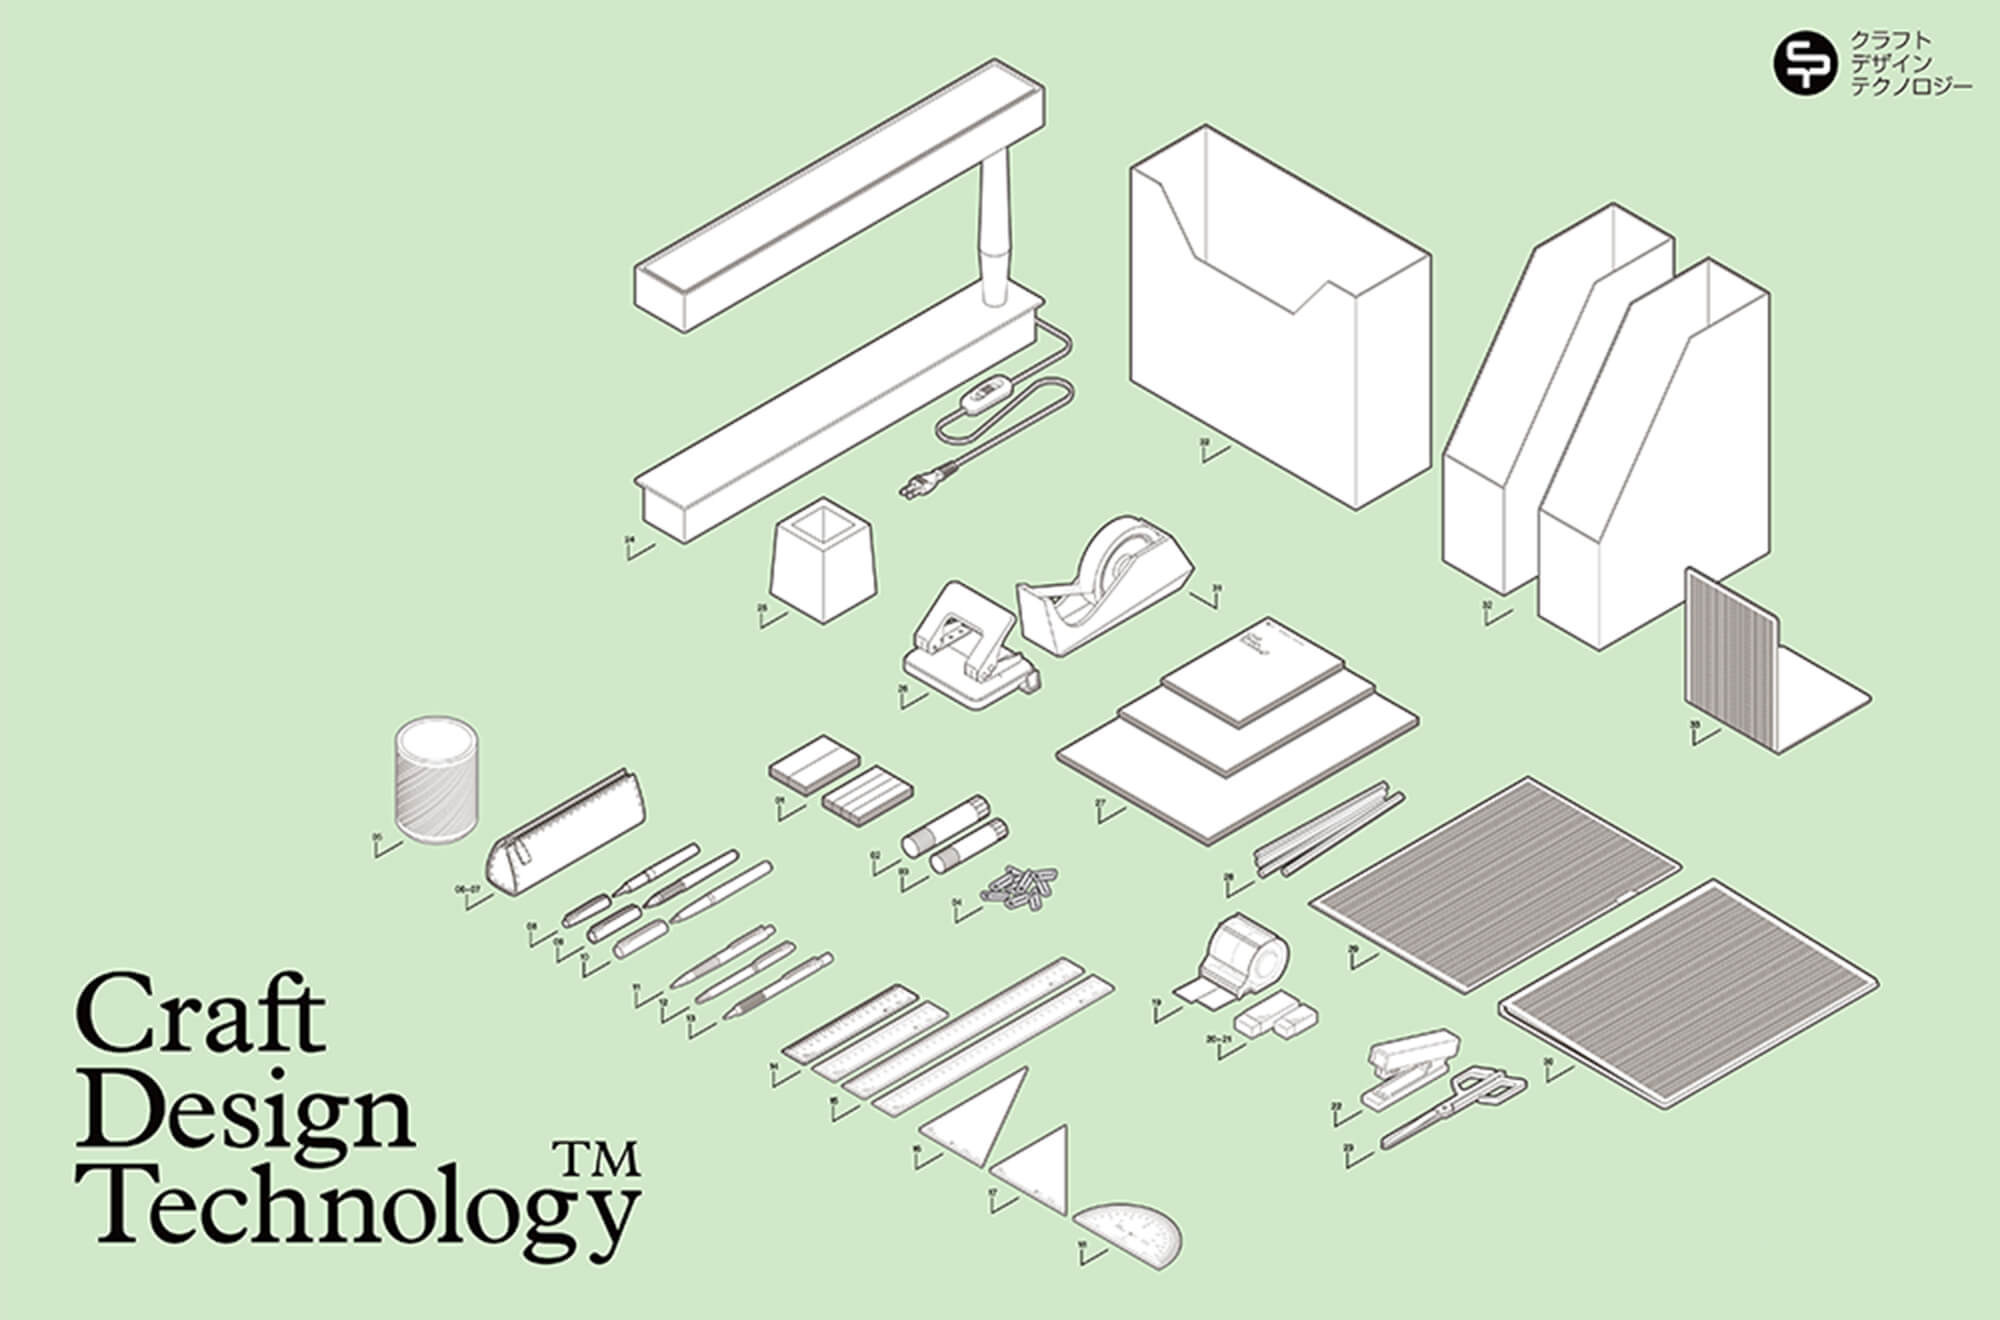 Craft Design technology